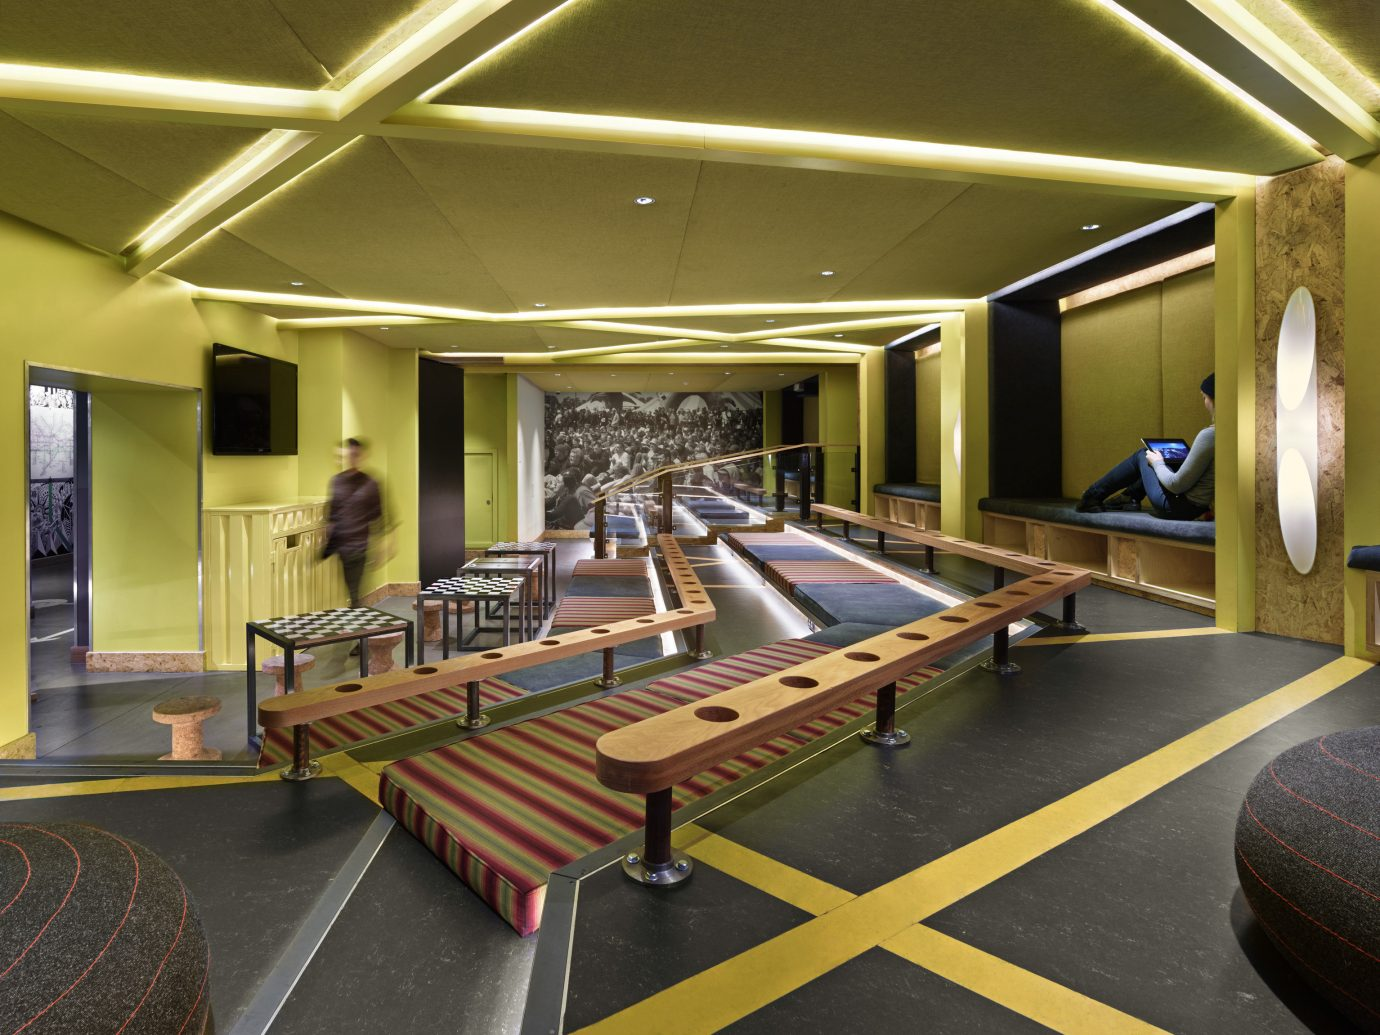 Budget Hotels London indoor ceiling floor recreation room room sport venue interior design estate Lobby living room Design conference hall furniture area